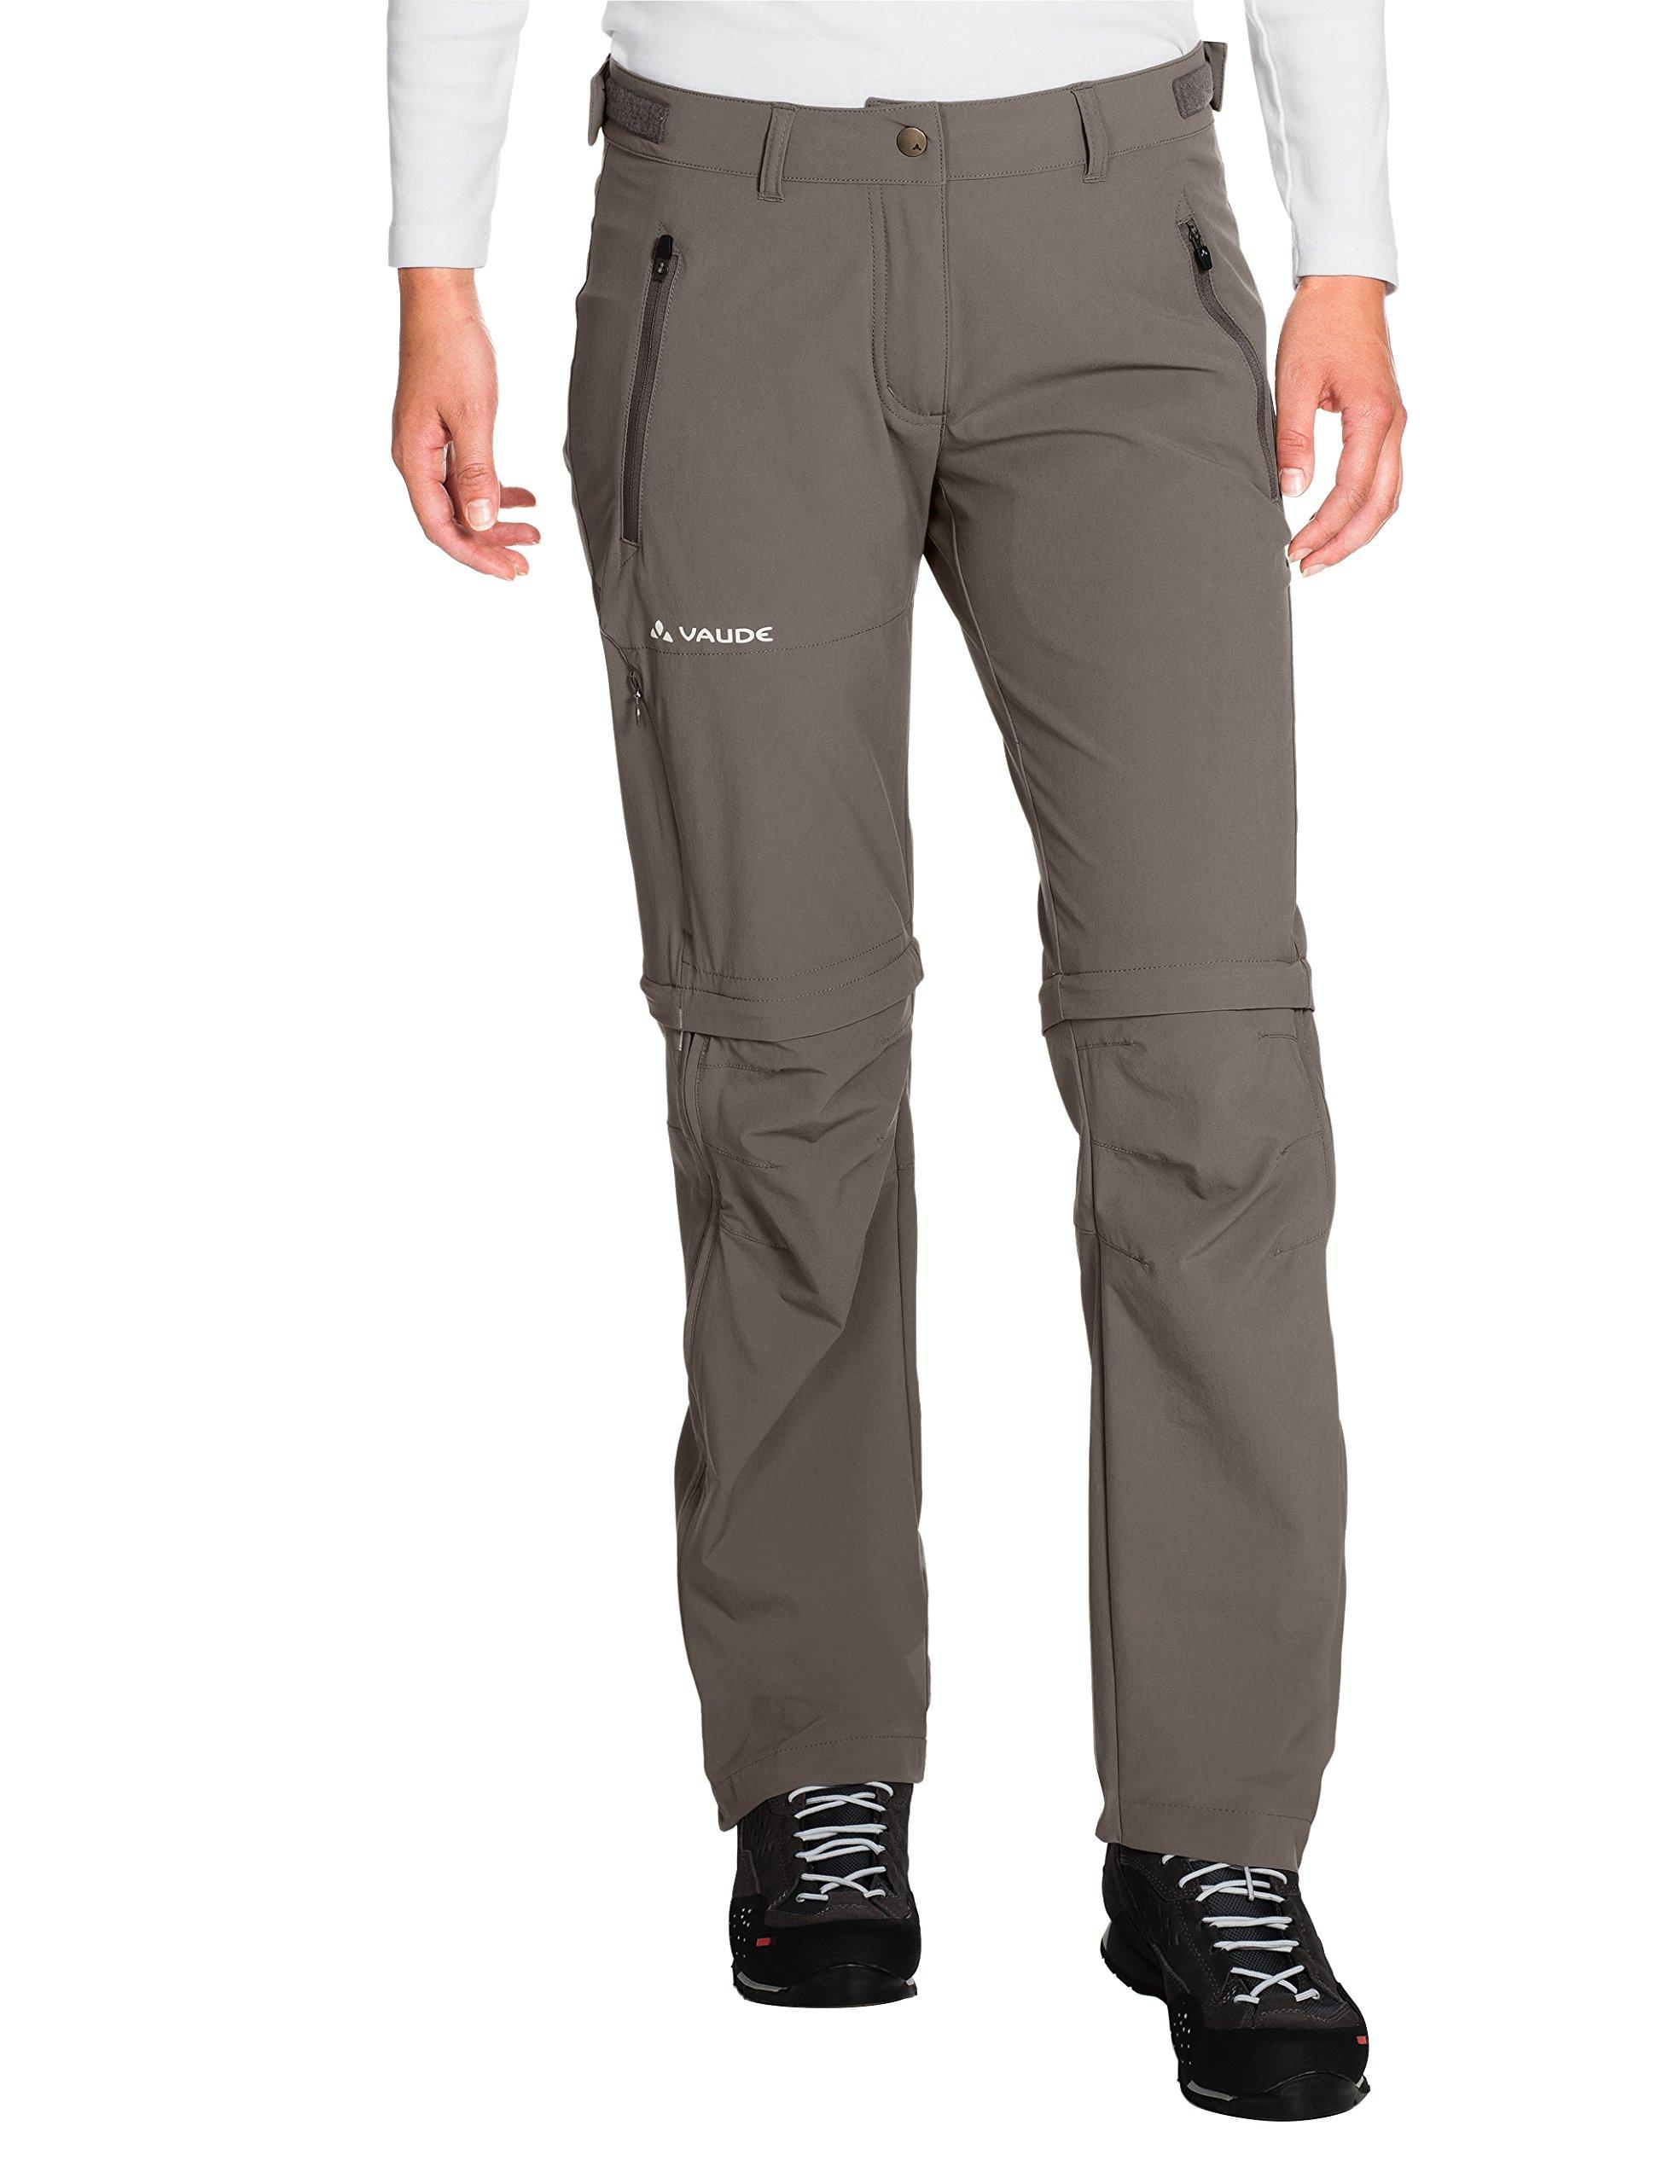 VAUDE Damen Hose Women's Farley Stretch ZO T-Zip Pants, Coconut, 34, 40144509634